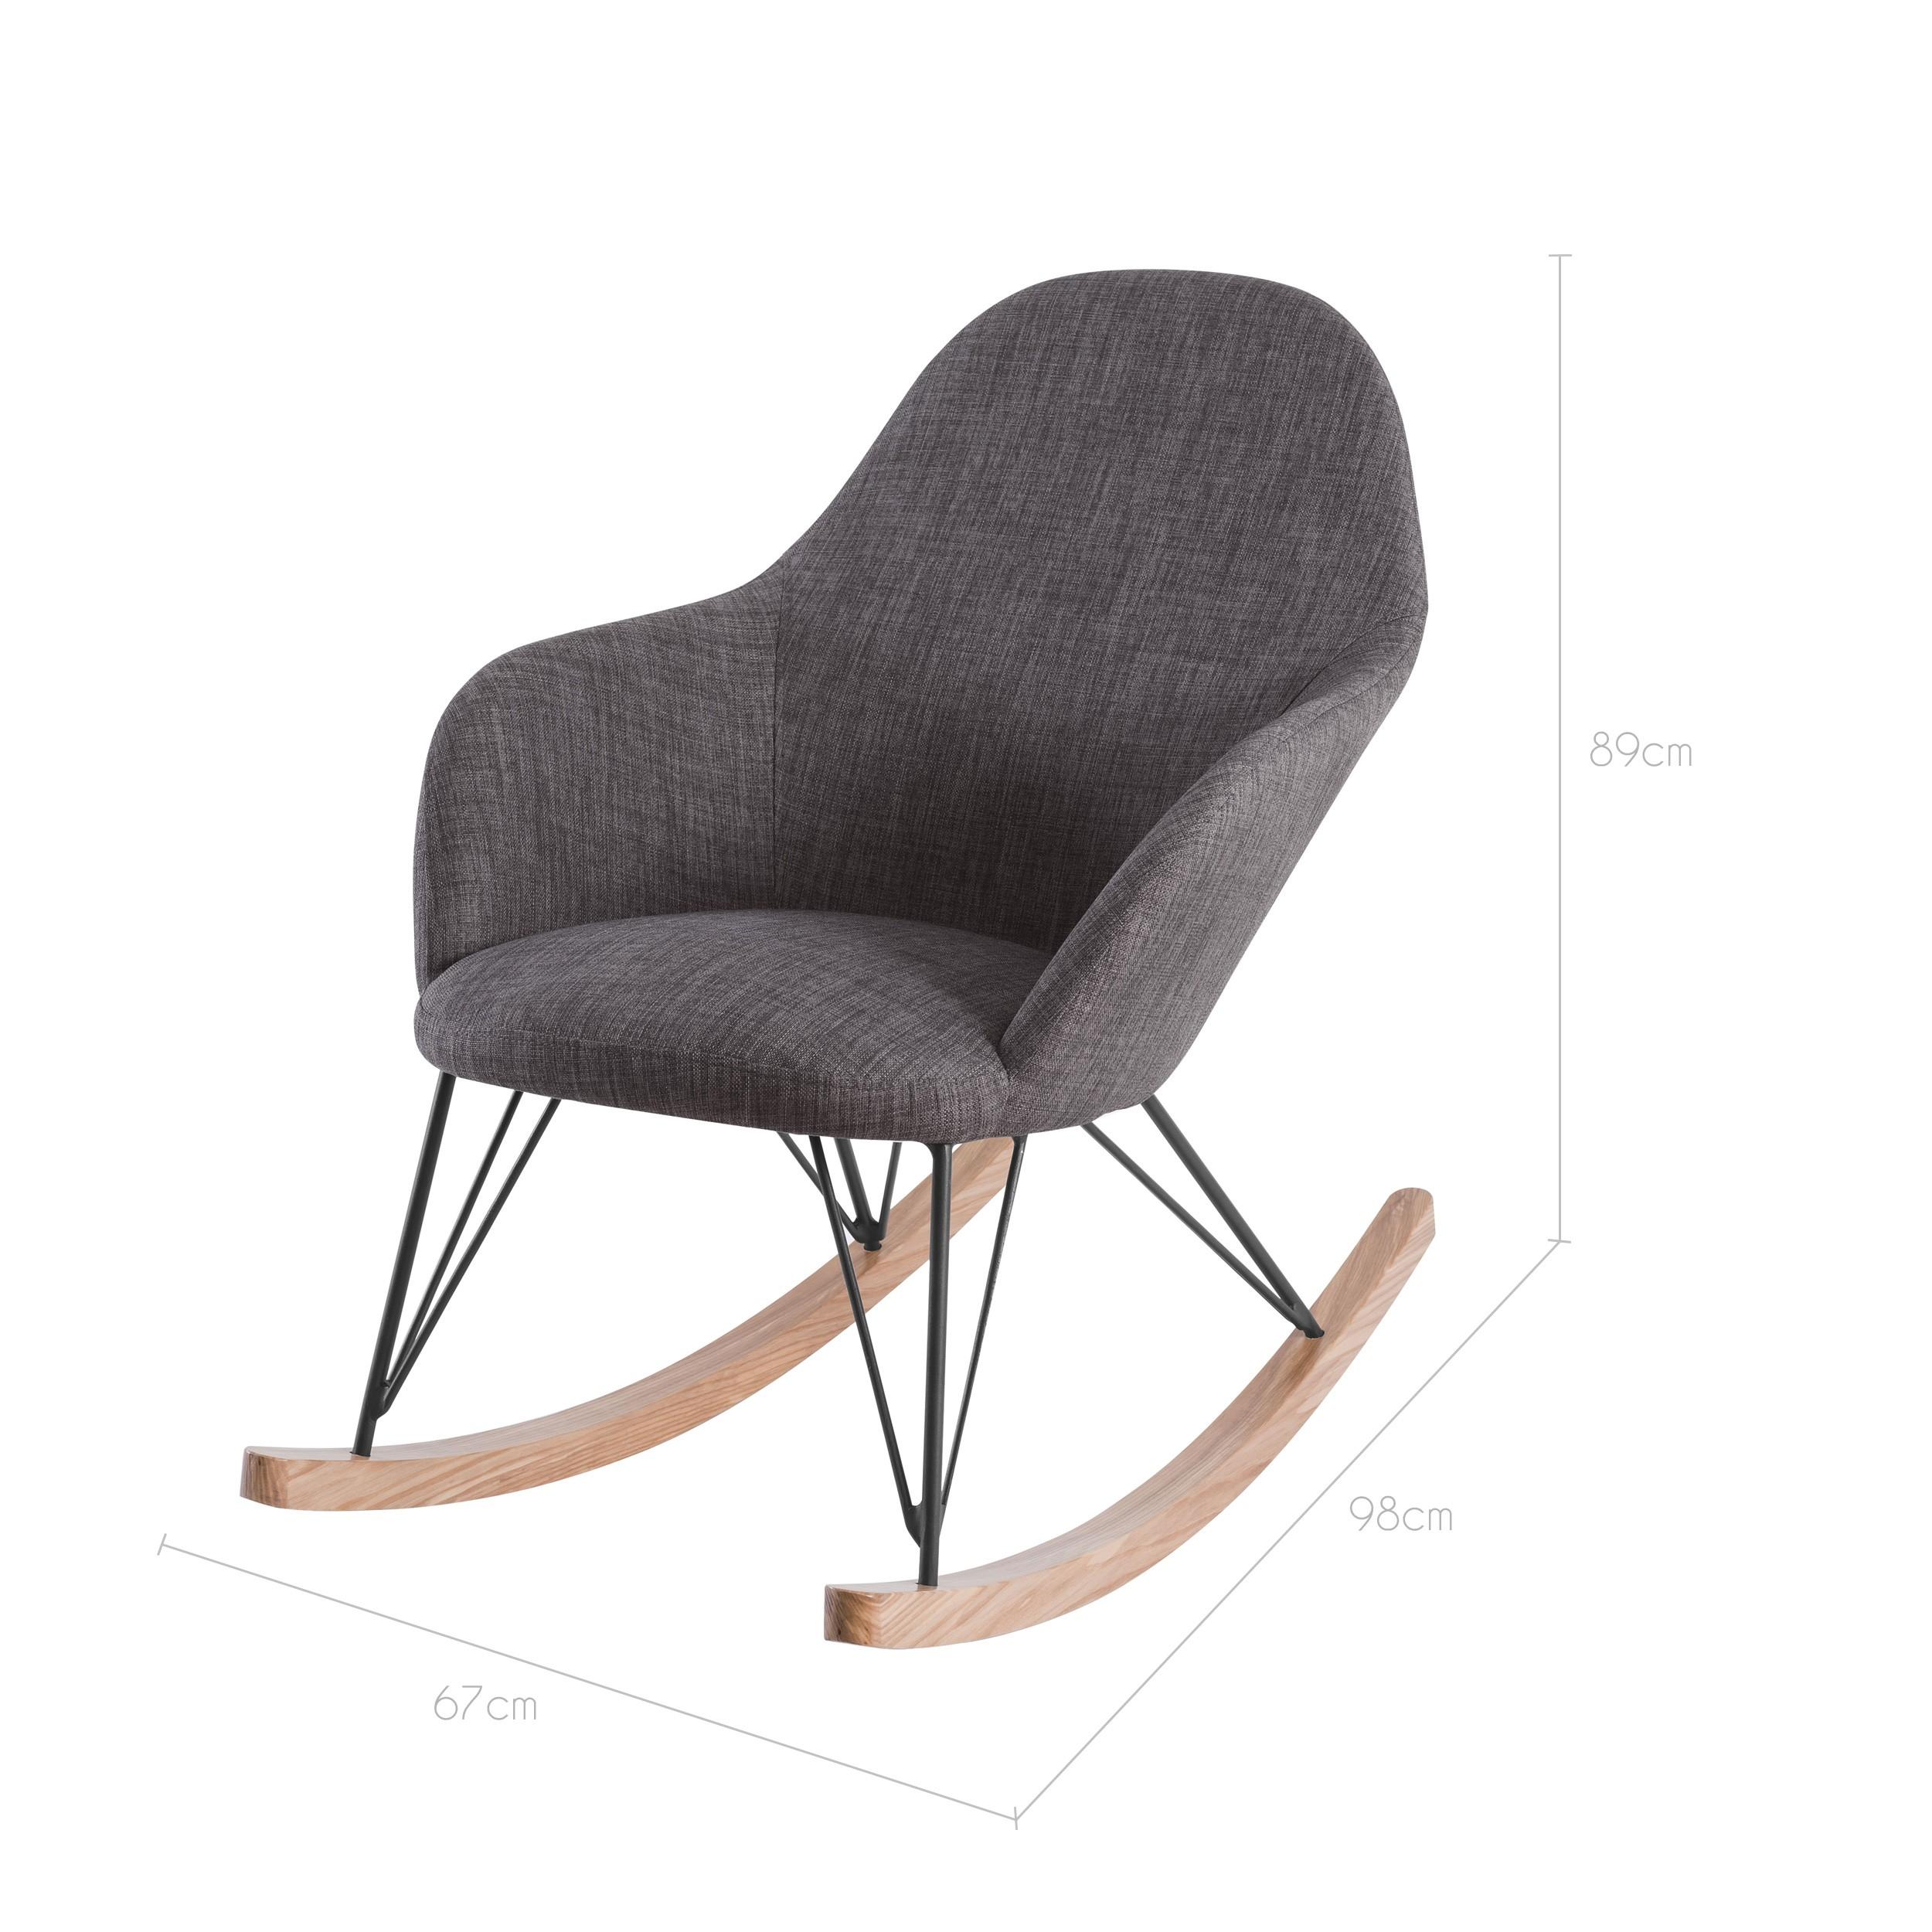 Vente Rocking Chair Gallery Of Fauteuils Dar